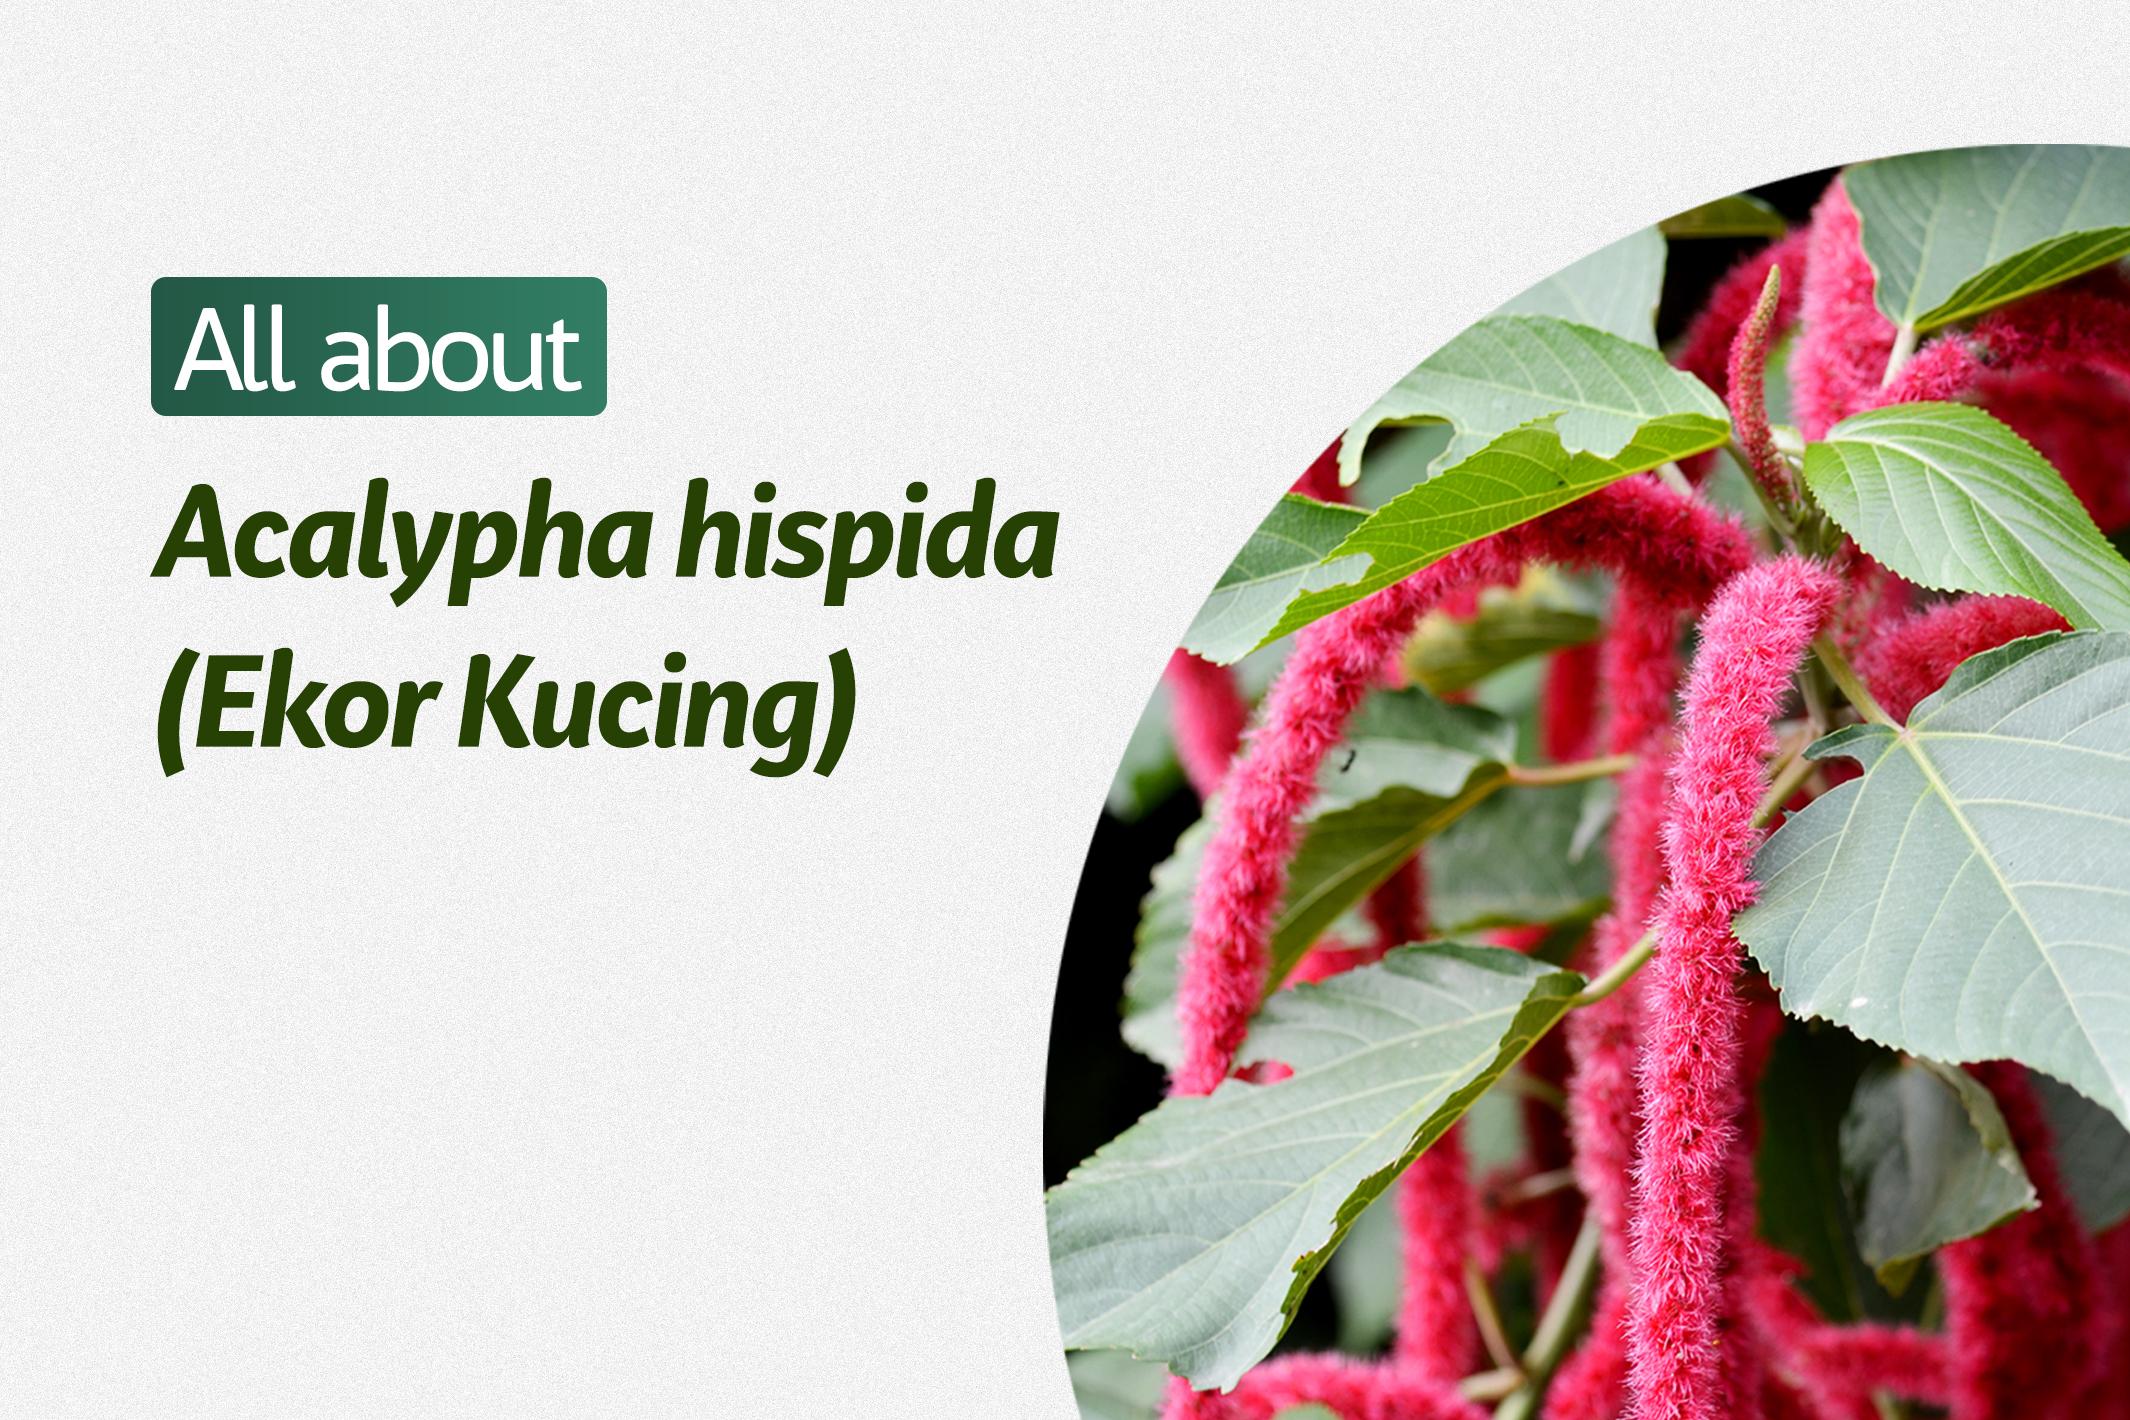 Acalypha Hispida (Ekor Kucing)